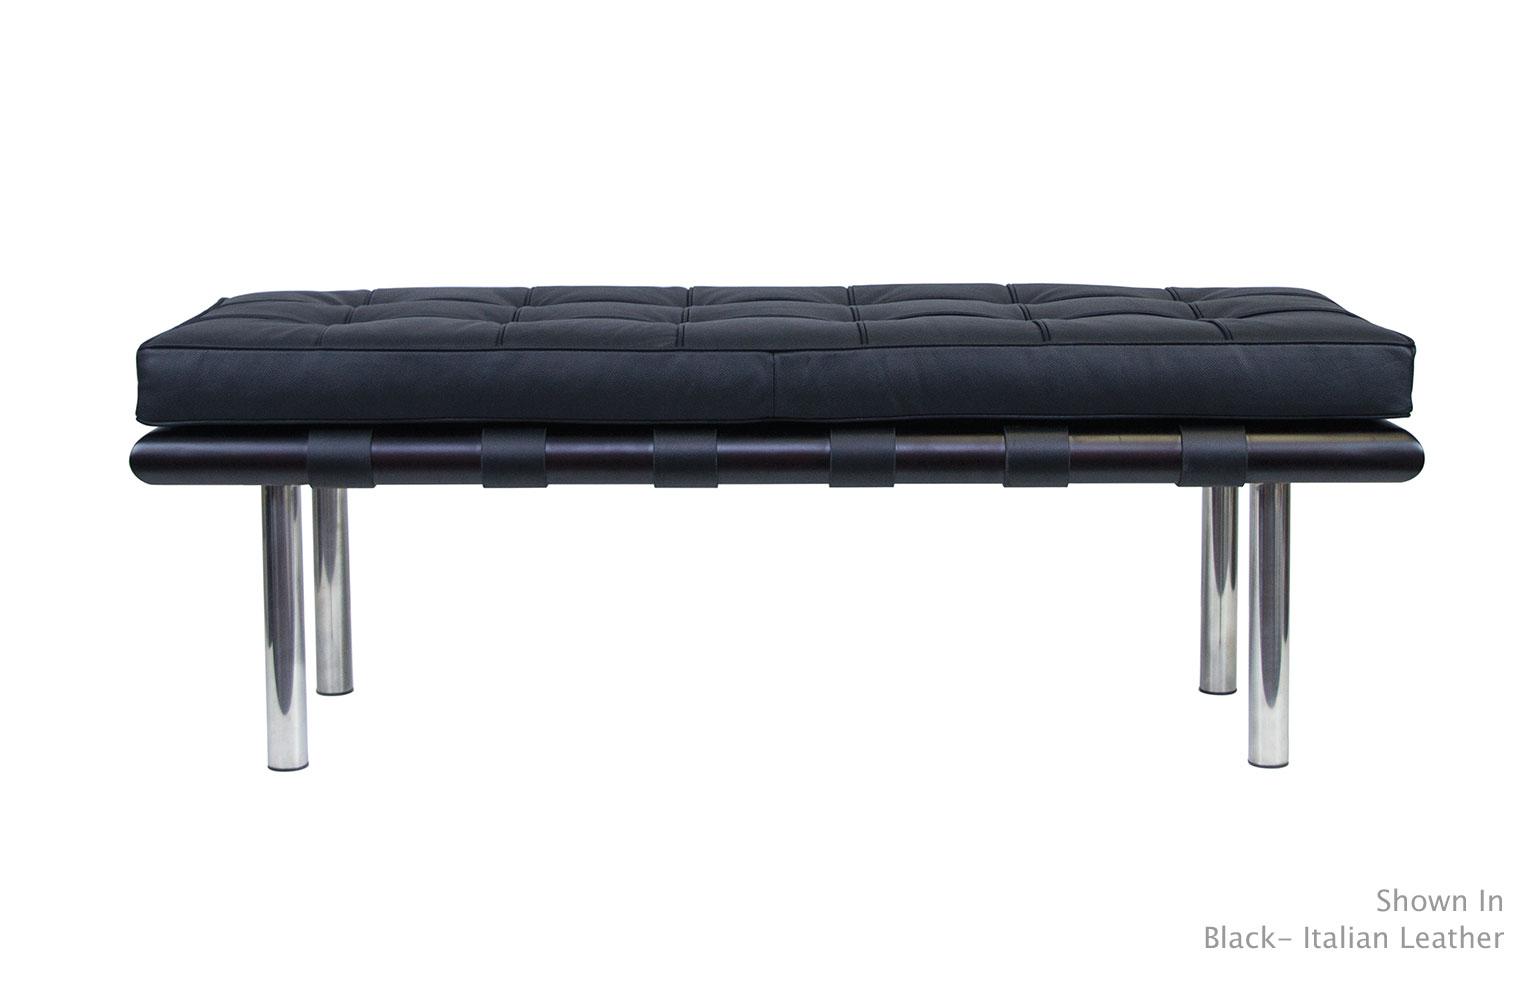 Barcelona Bench Modern Furniture Van Der Rohe Serenity Living